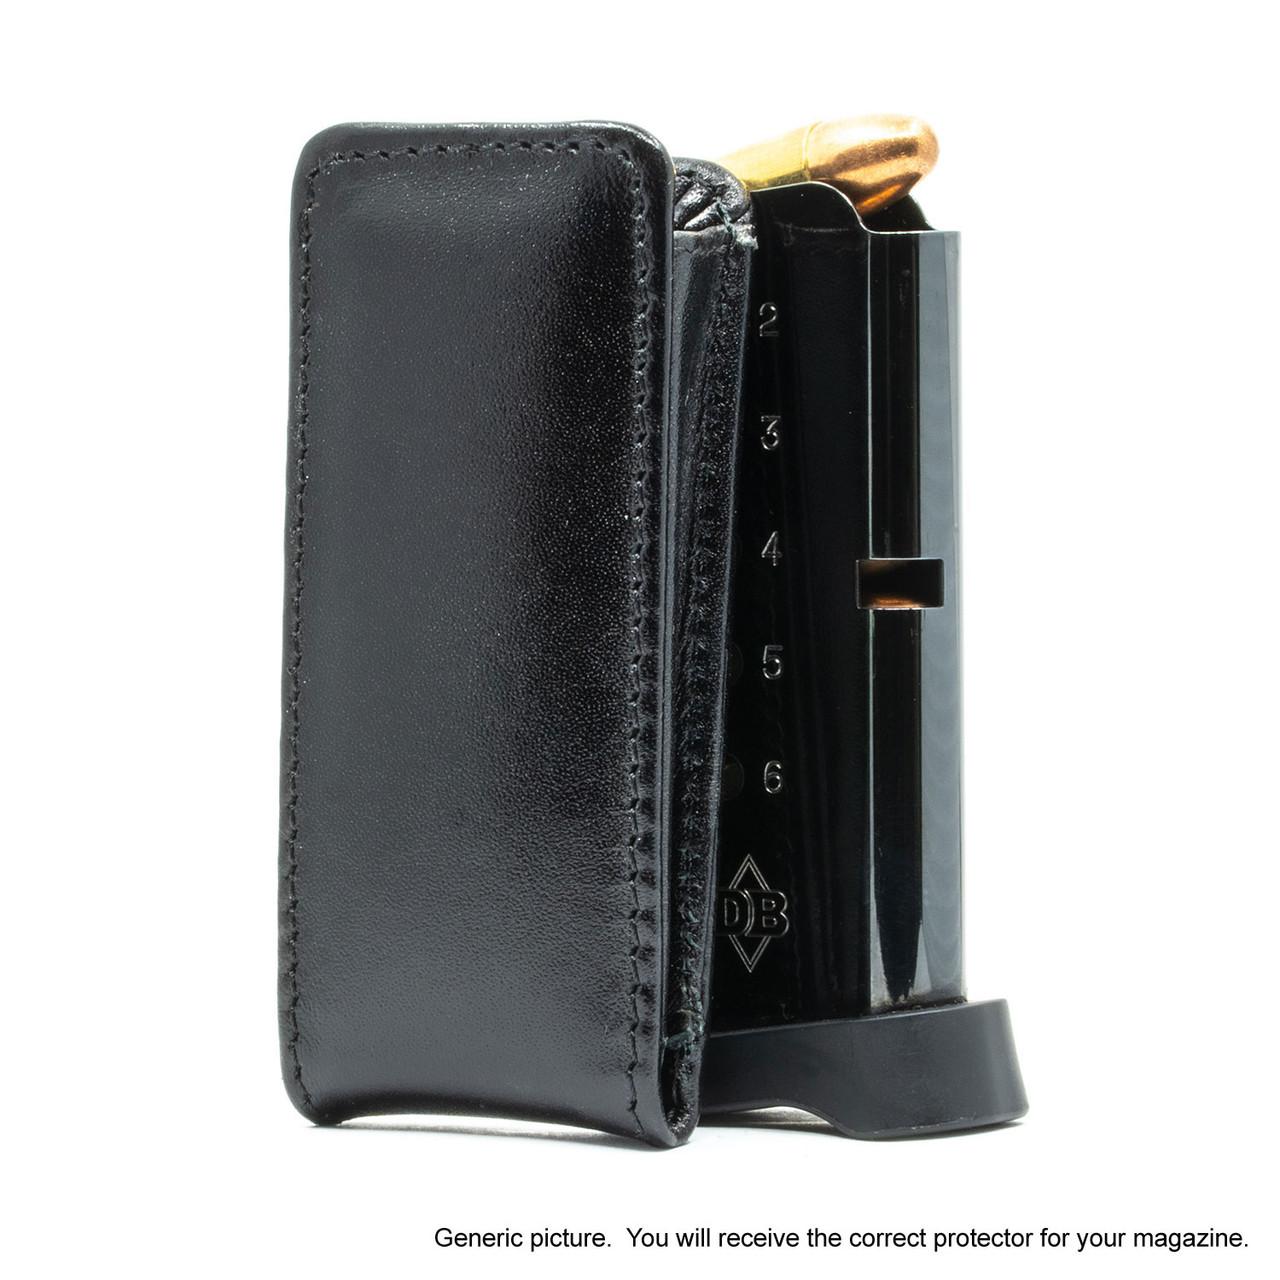 Remington RM380 Black Leather Magazine Pocket Protector